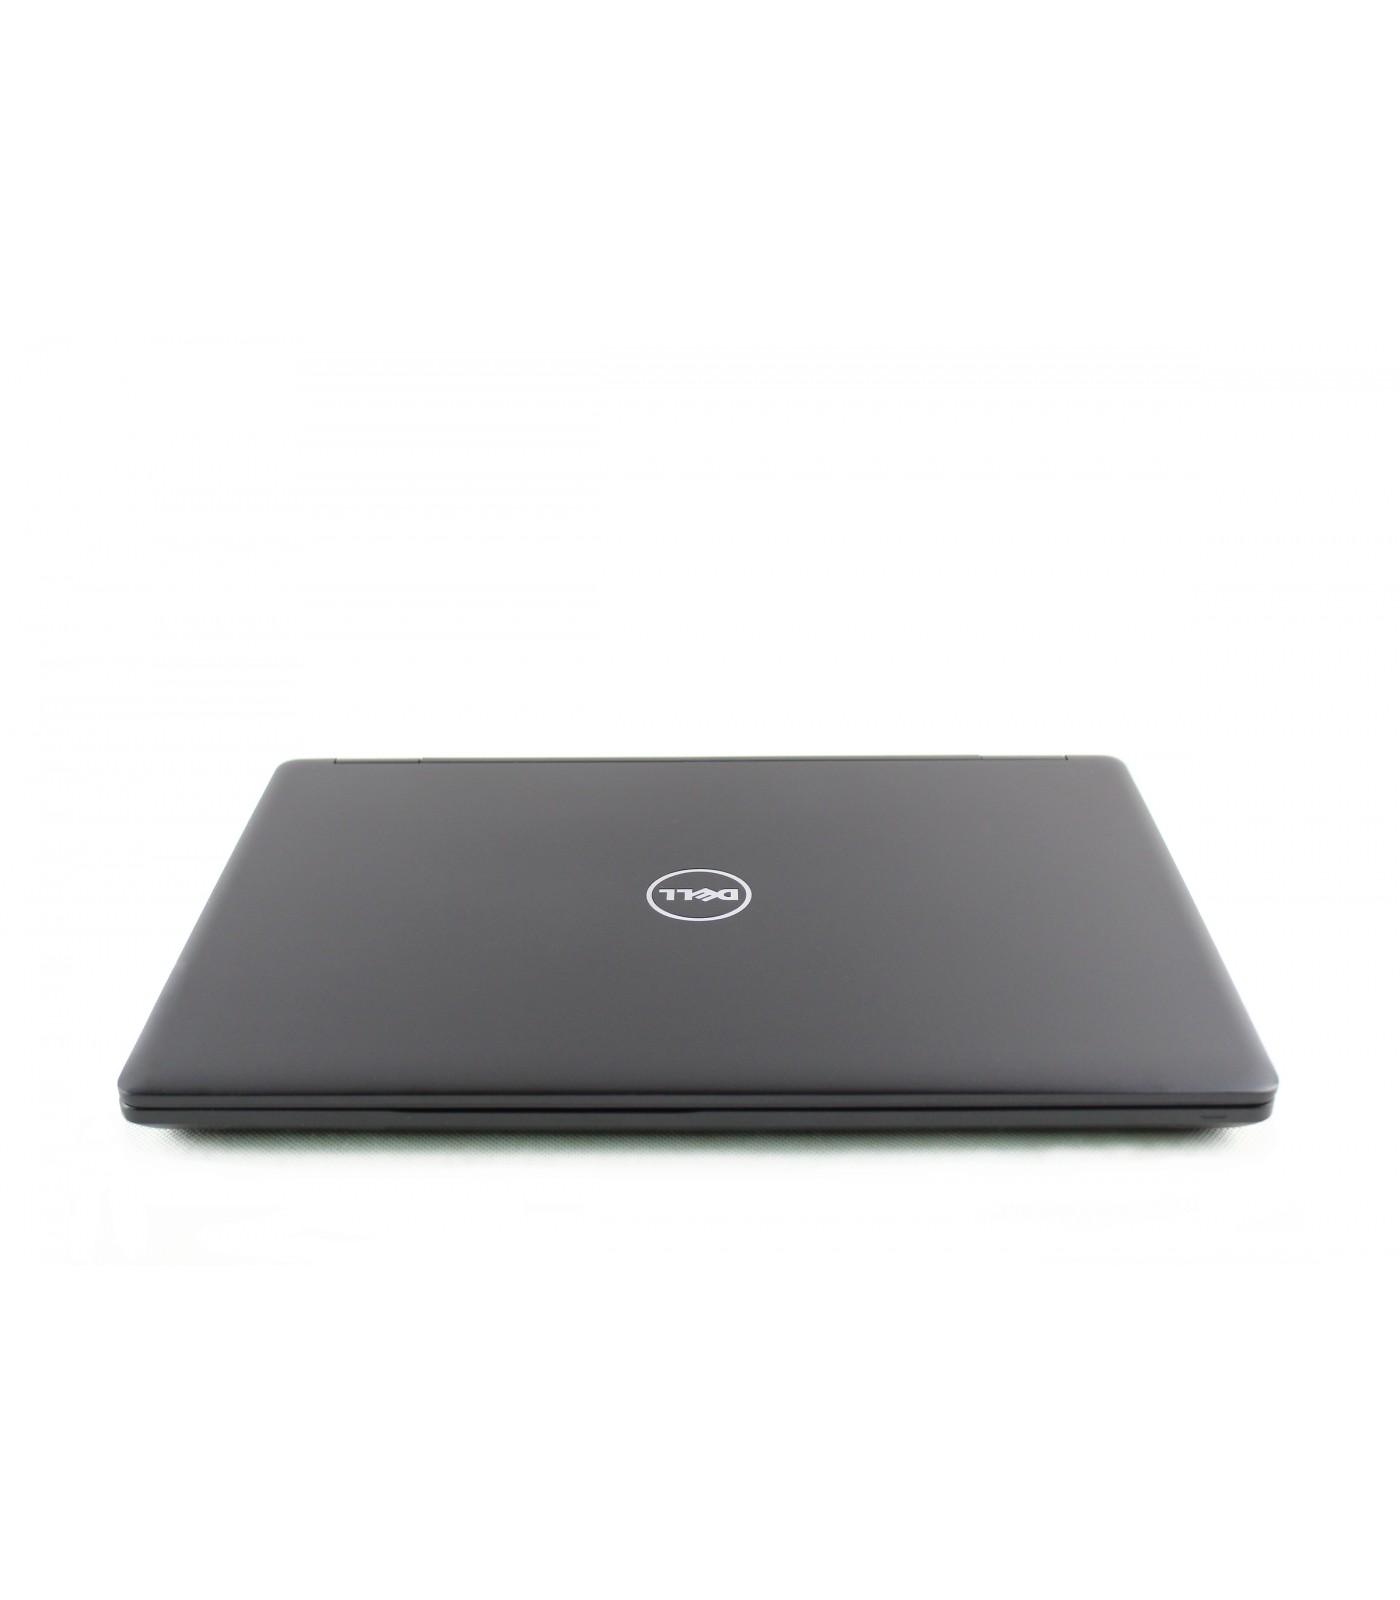 Dell Precision 3520 1920x1080 IPS Nvidia Quadro M620 Klasa B